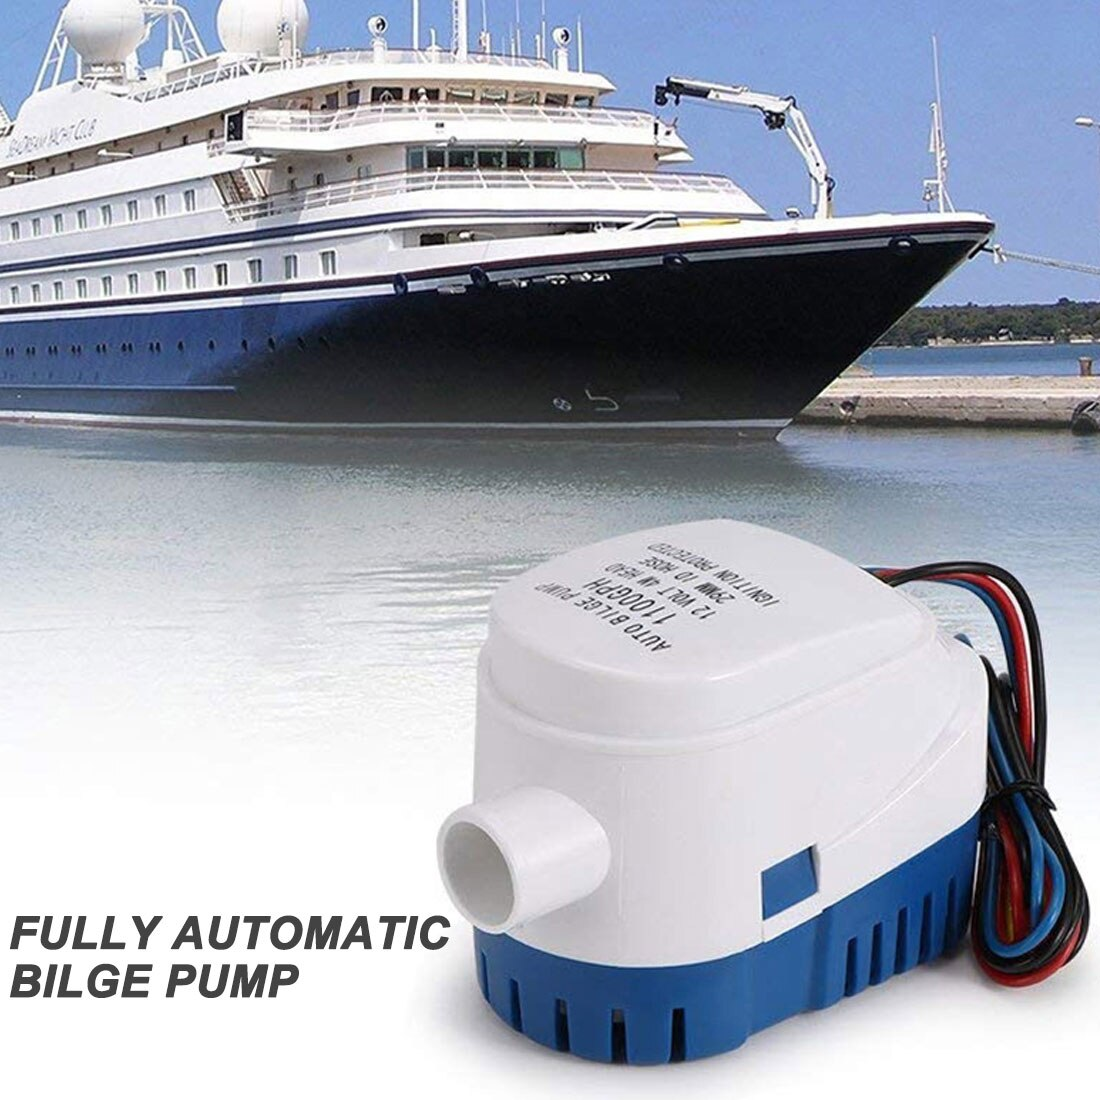 600 750 1100GPH التلقائي قارب مضخة نزح 12 فولت 24 فولت تيار مستمر غاطسة مضخة مياه كهربائية صغيرة